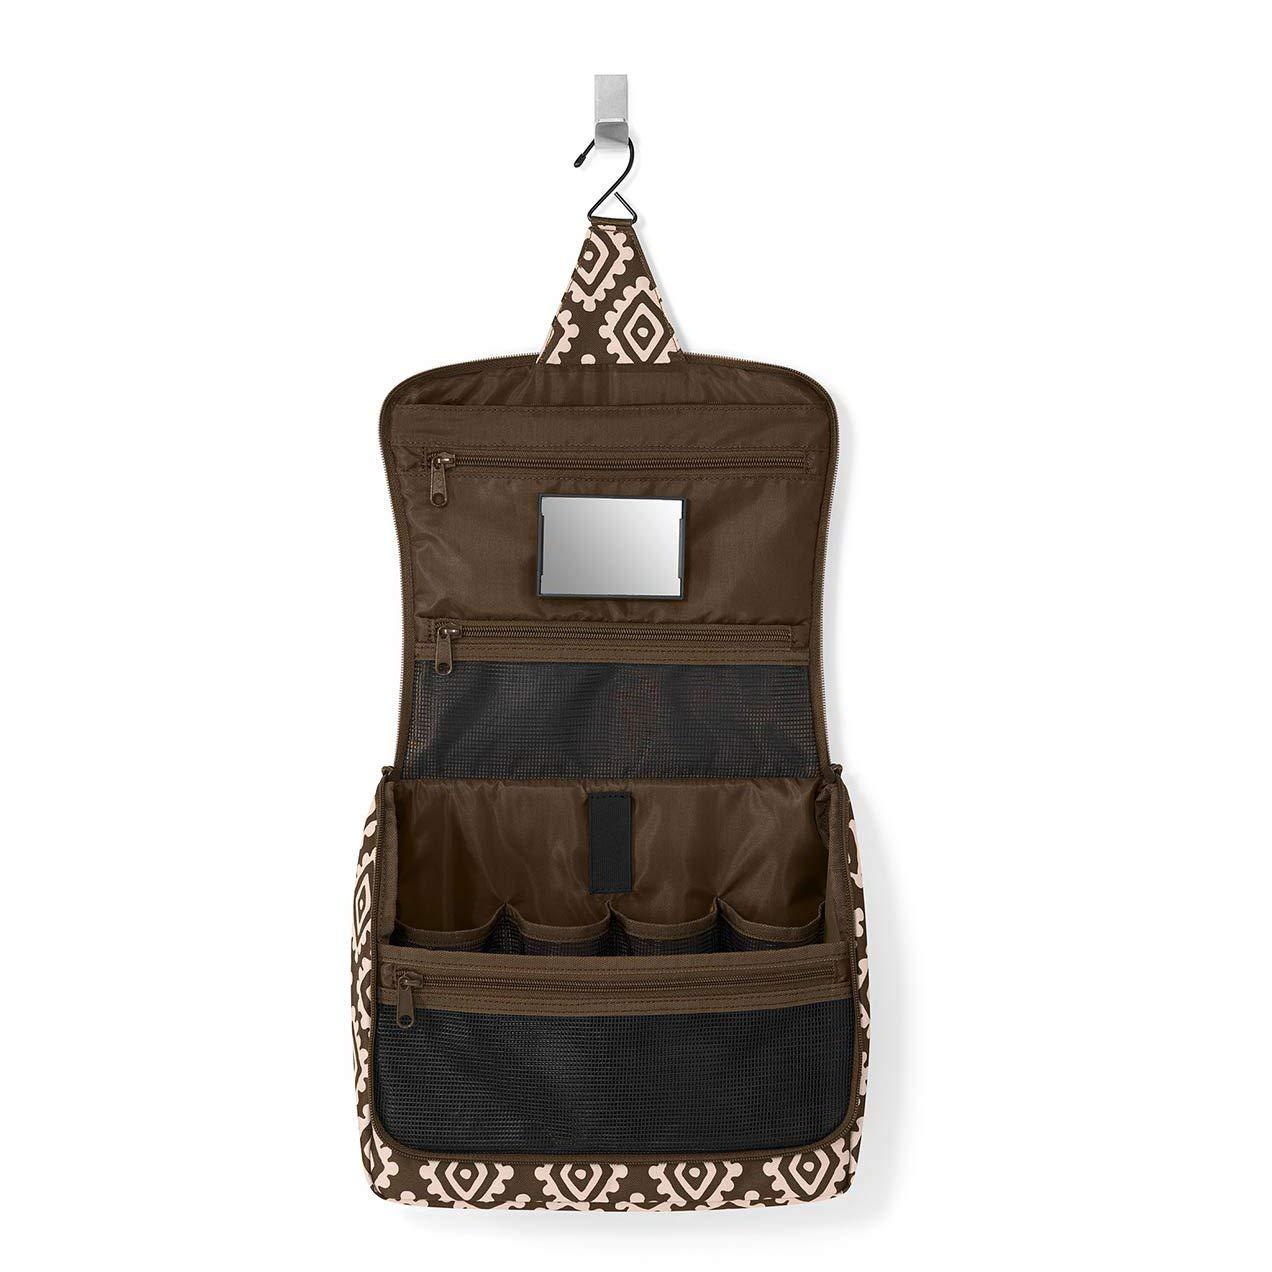 28 cm Marrone 4 liters Diamonds Mocha Reisenthel toiletbag XL Beauty Case da viaggio